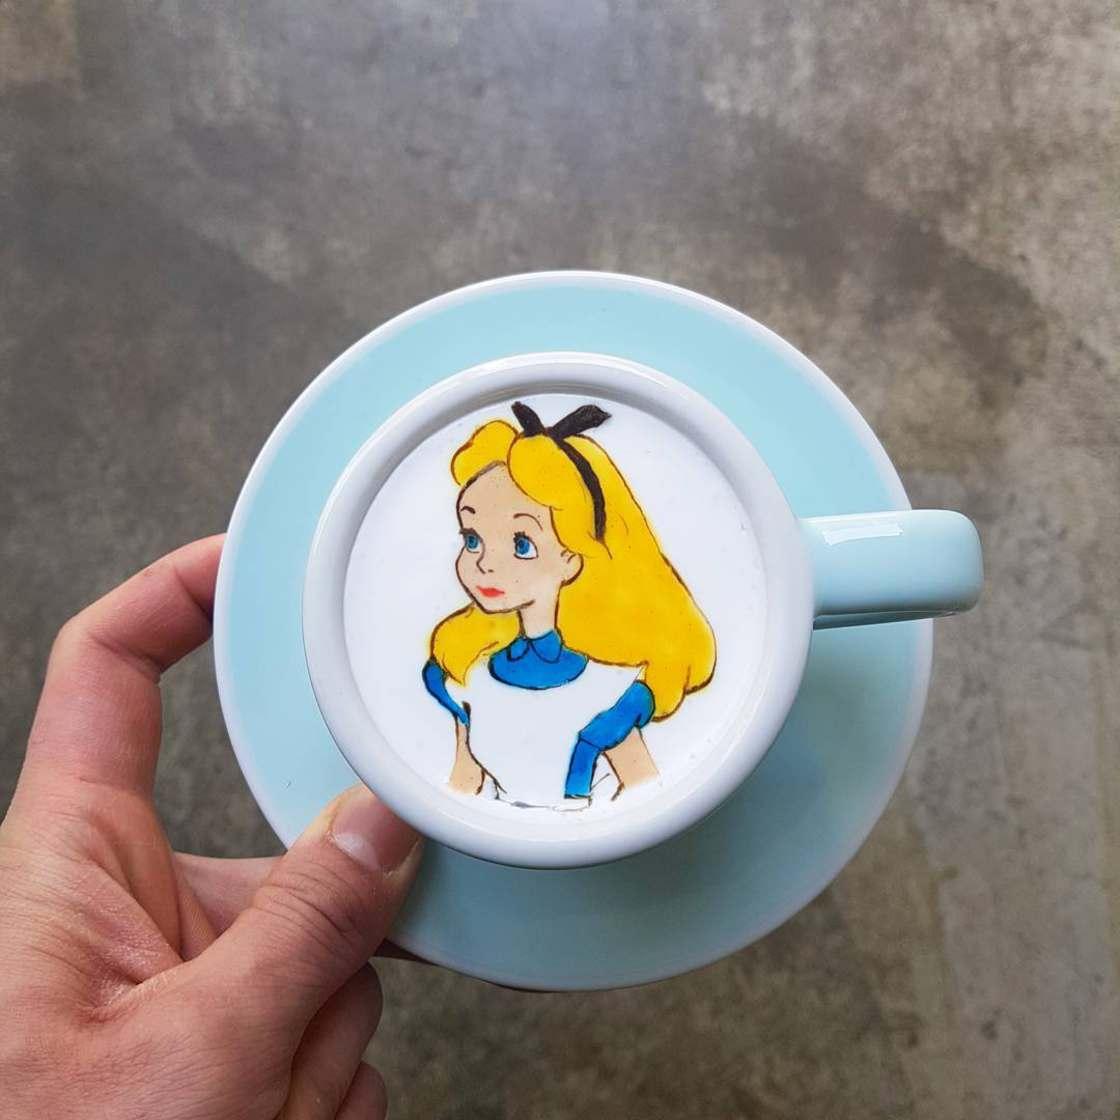 Art On Coffee - Barista creates impressive art on your coffee foam